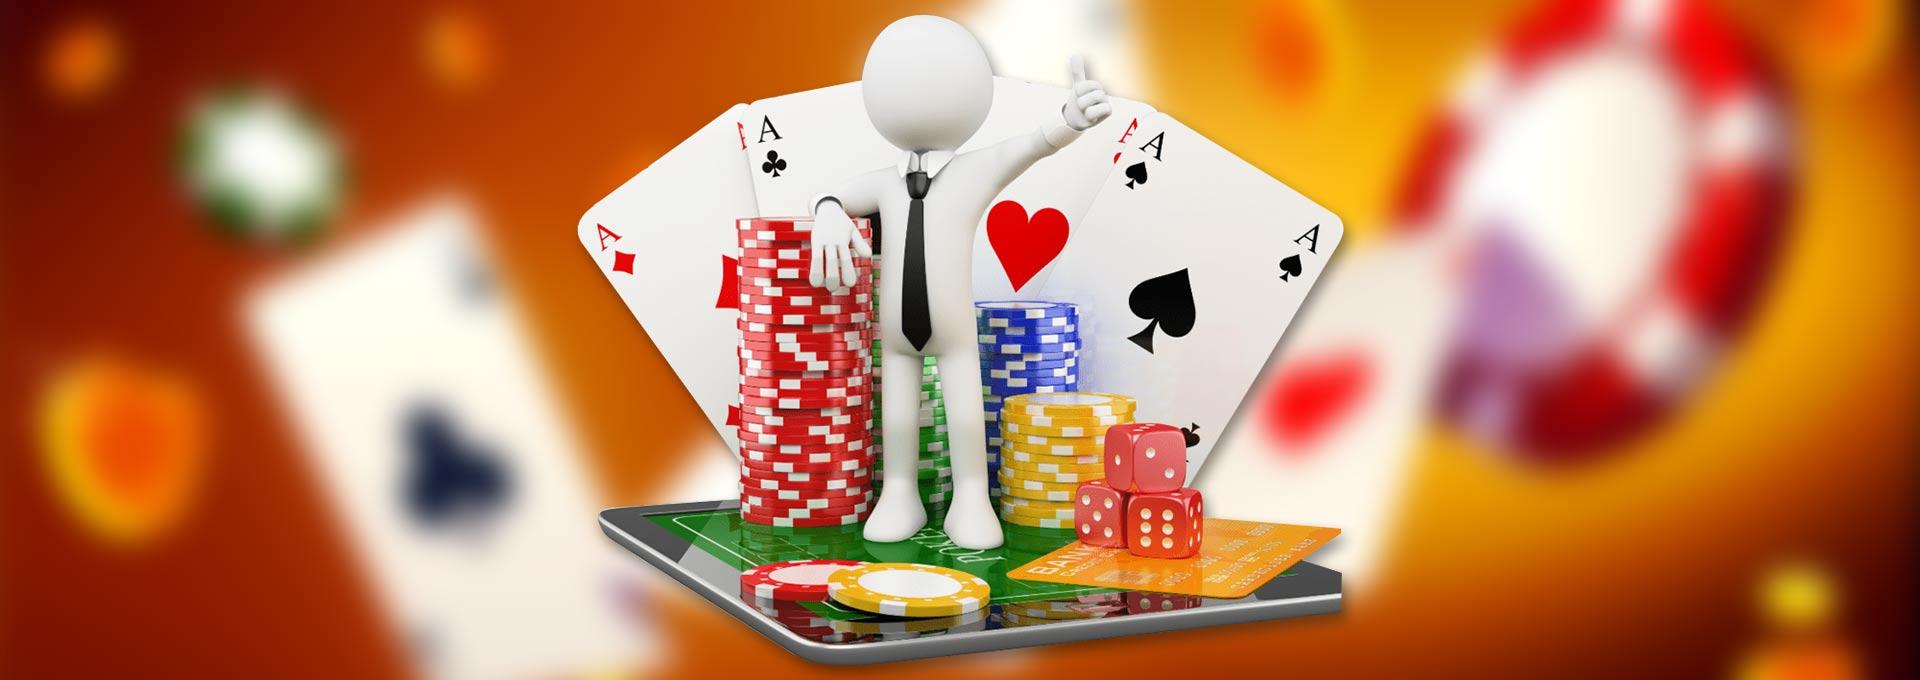 omaha-poker-game